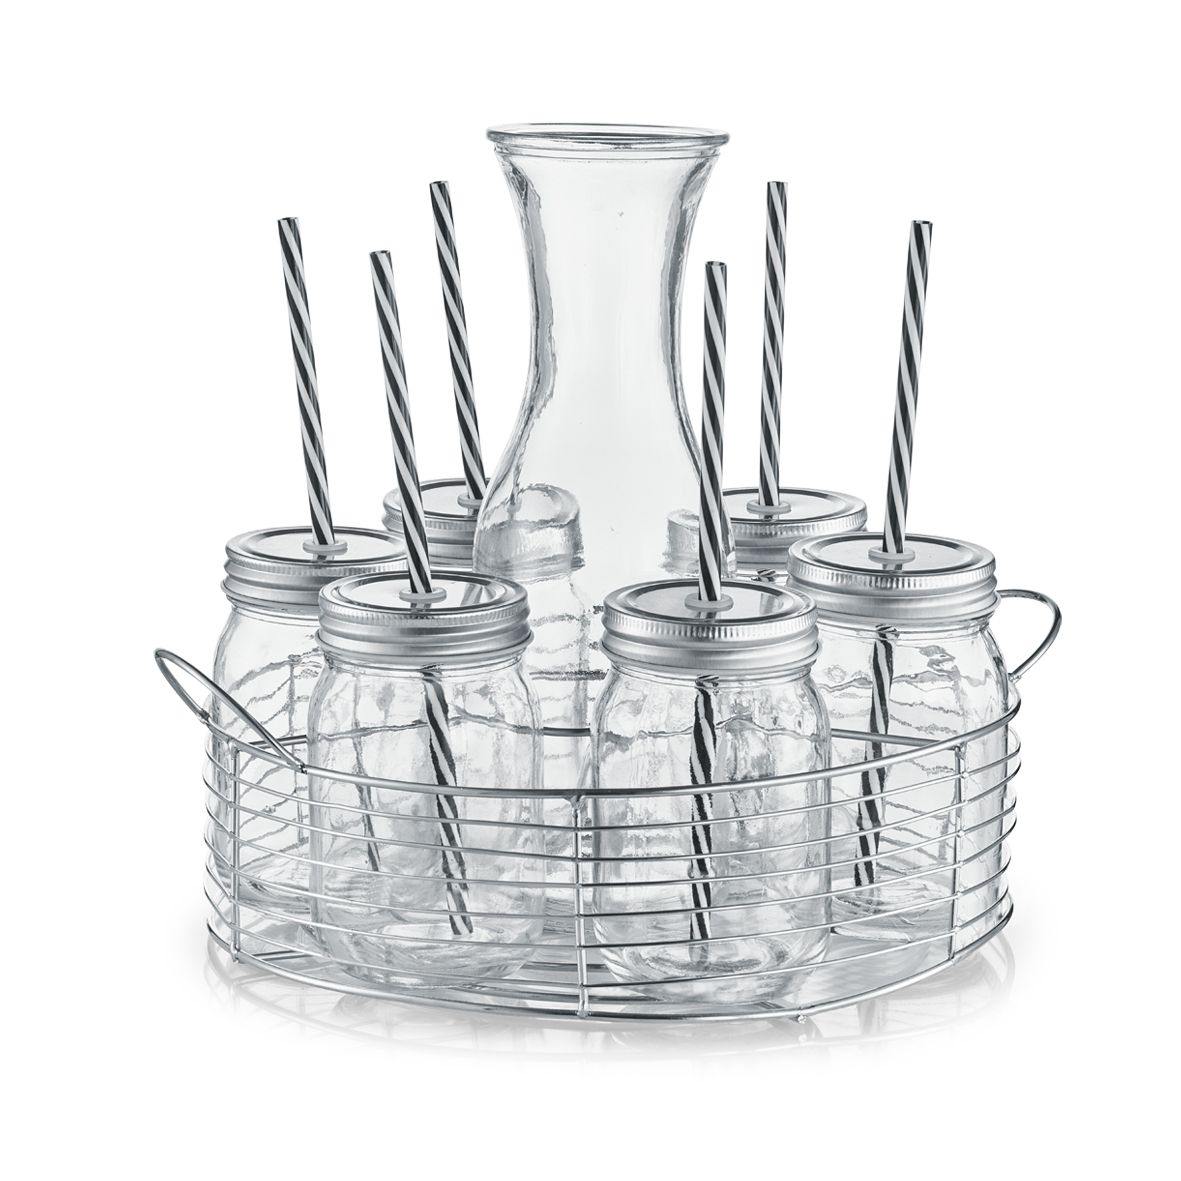 Set carafa si pahare pentru limonada, cu suport metalic, 8 piese somproduct.ro